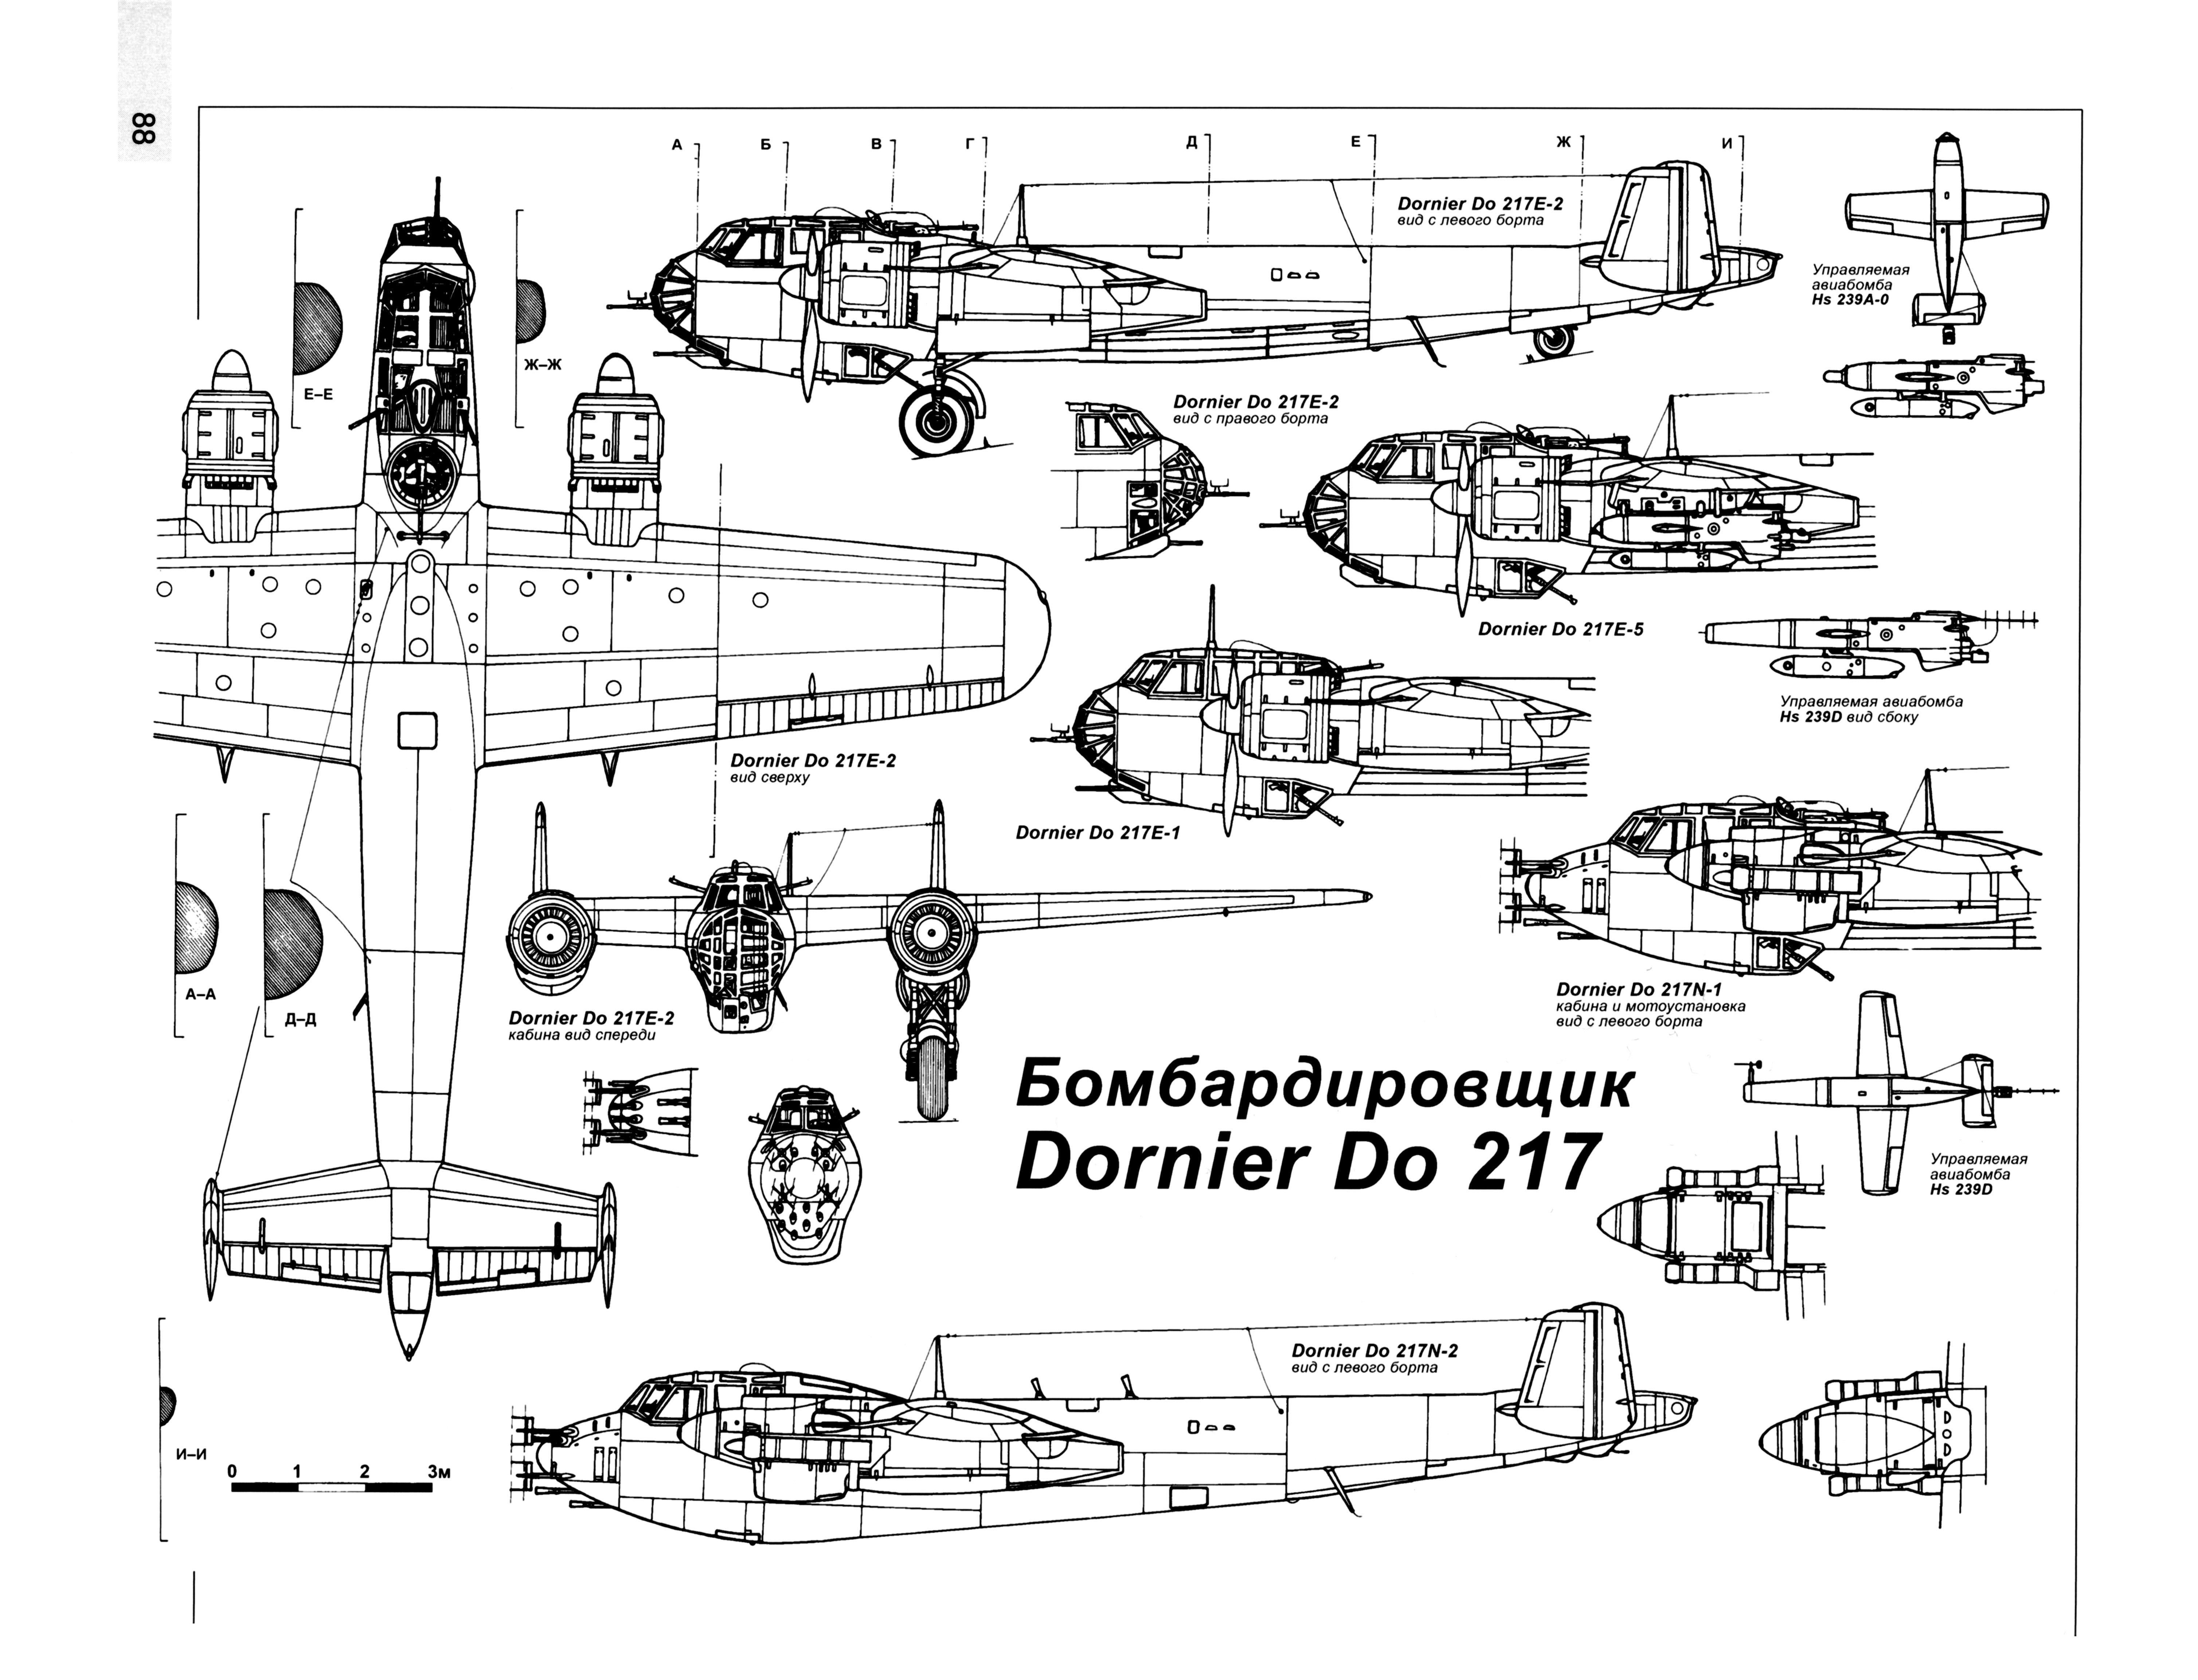 Dornier Do 217 Blueprint